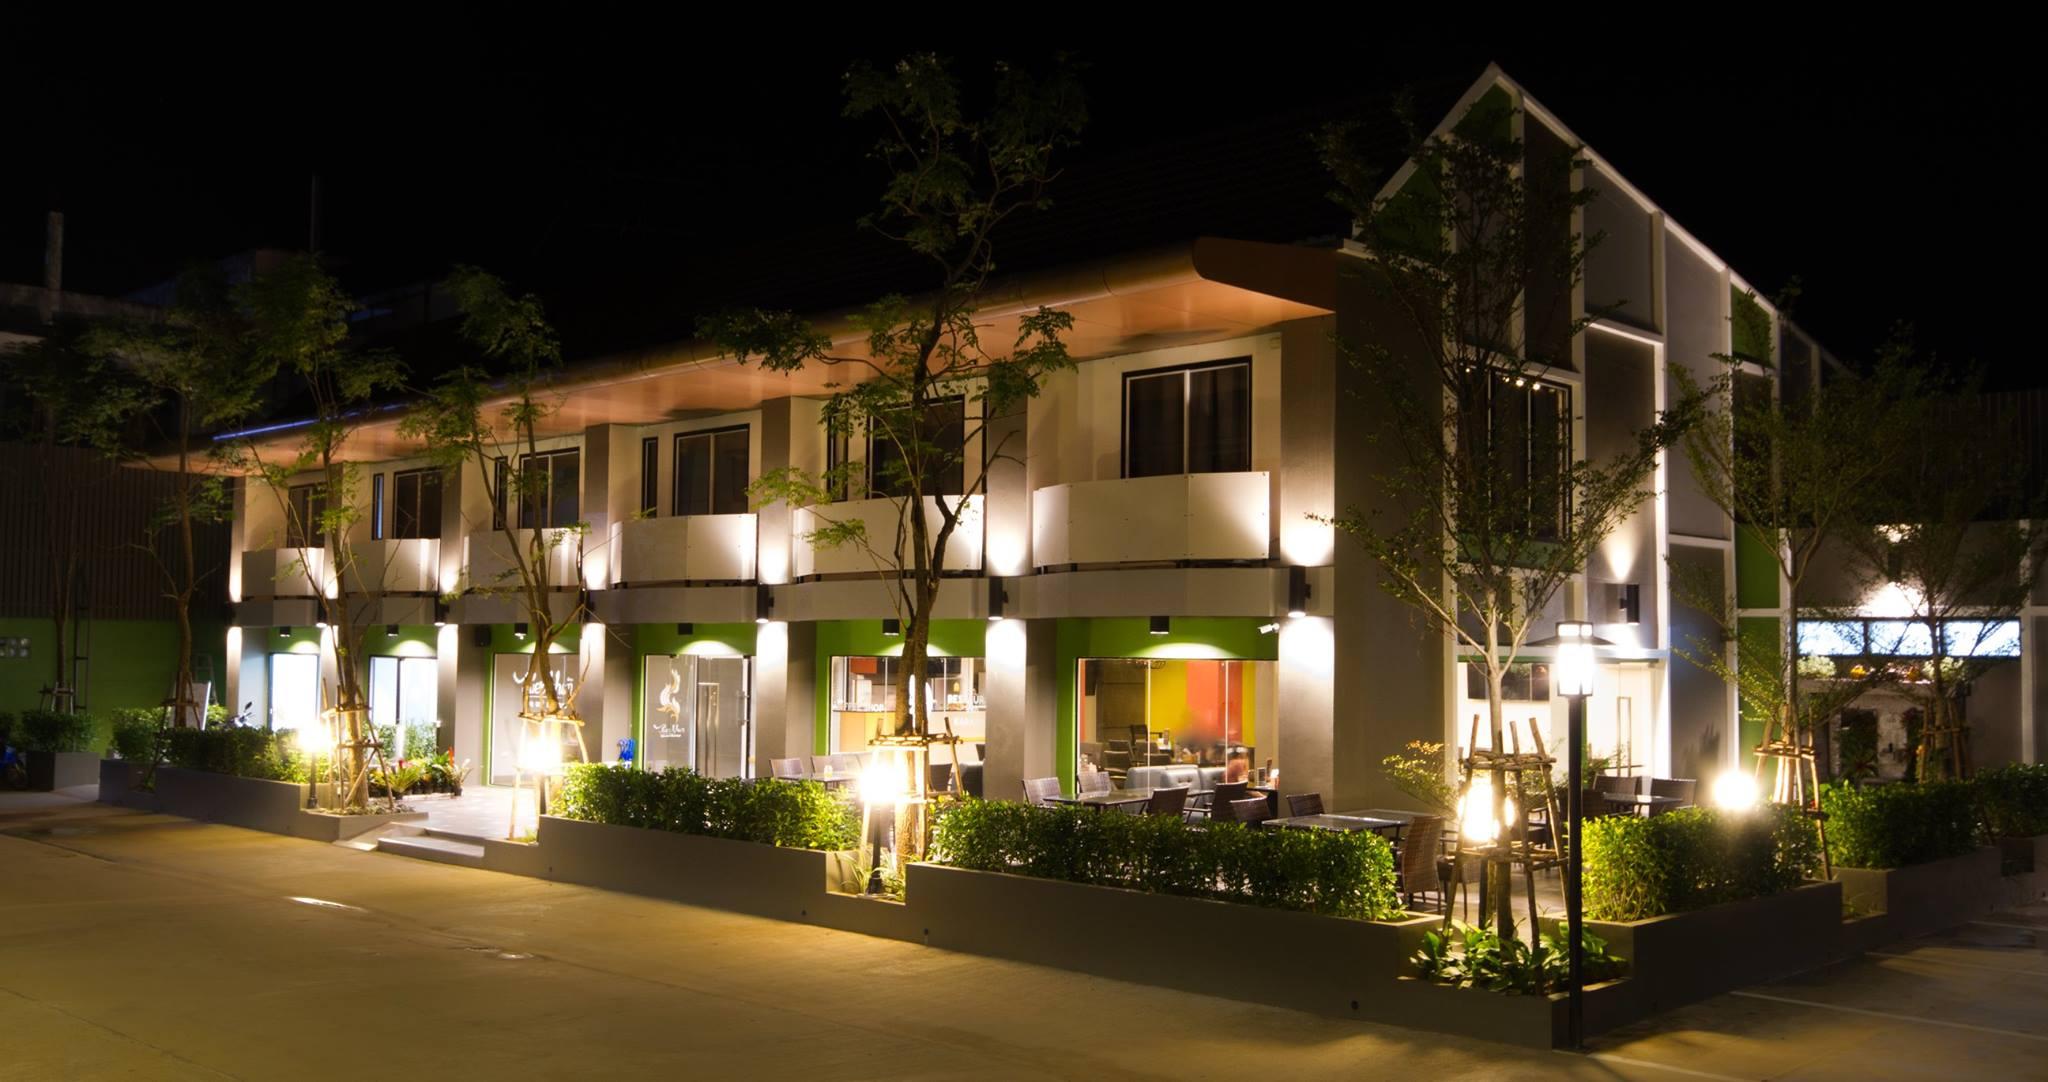 Bestiny Hotel and Restaurant